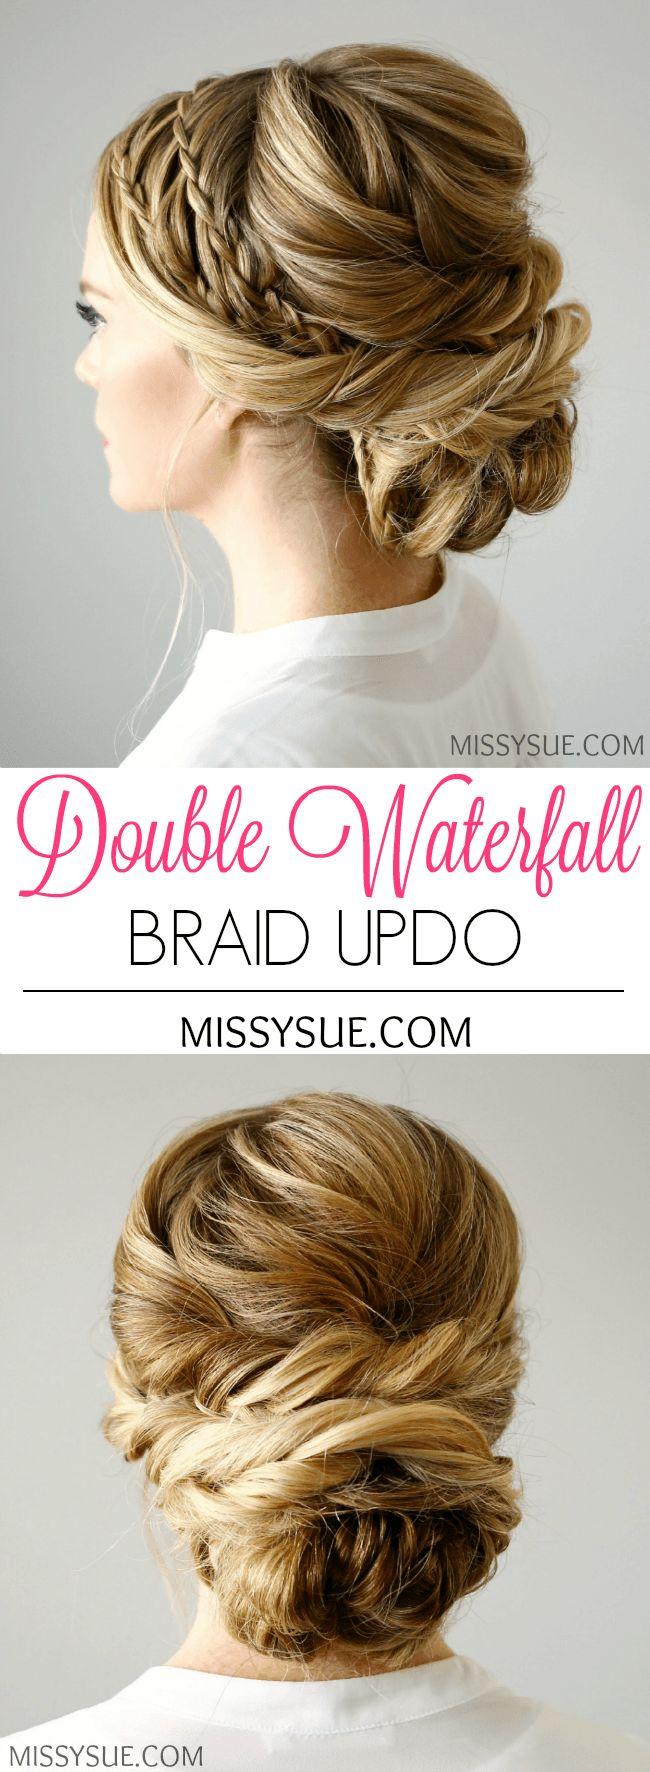 Enjoyable 1000 Ideas About Braided Updo On Pinterest Braids Braided Short Hairstyles For Black Women Fulllsitofus